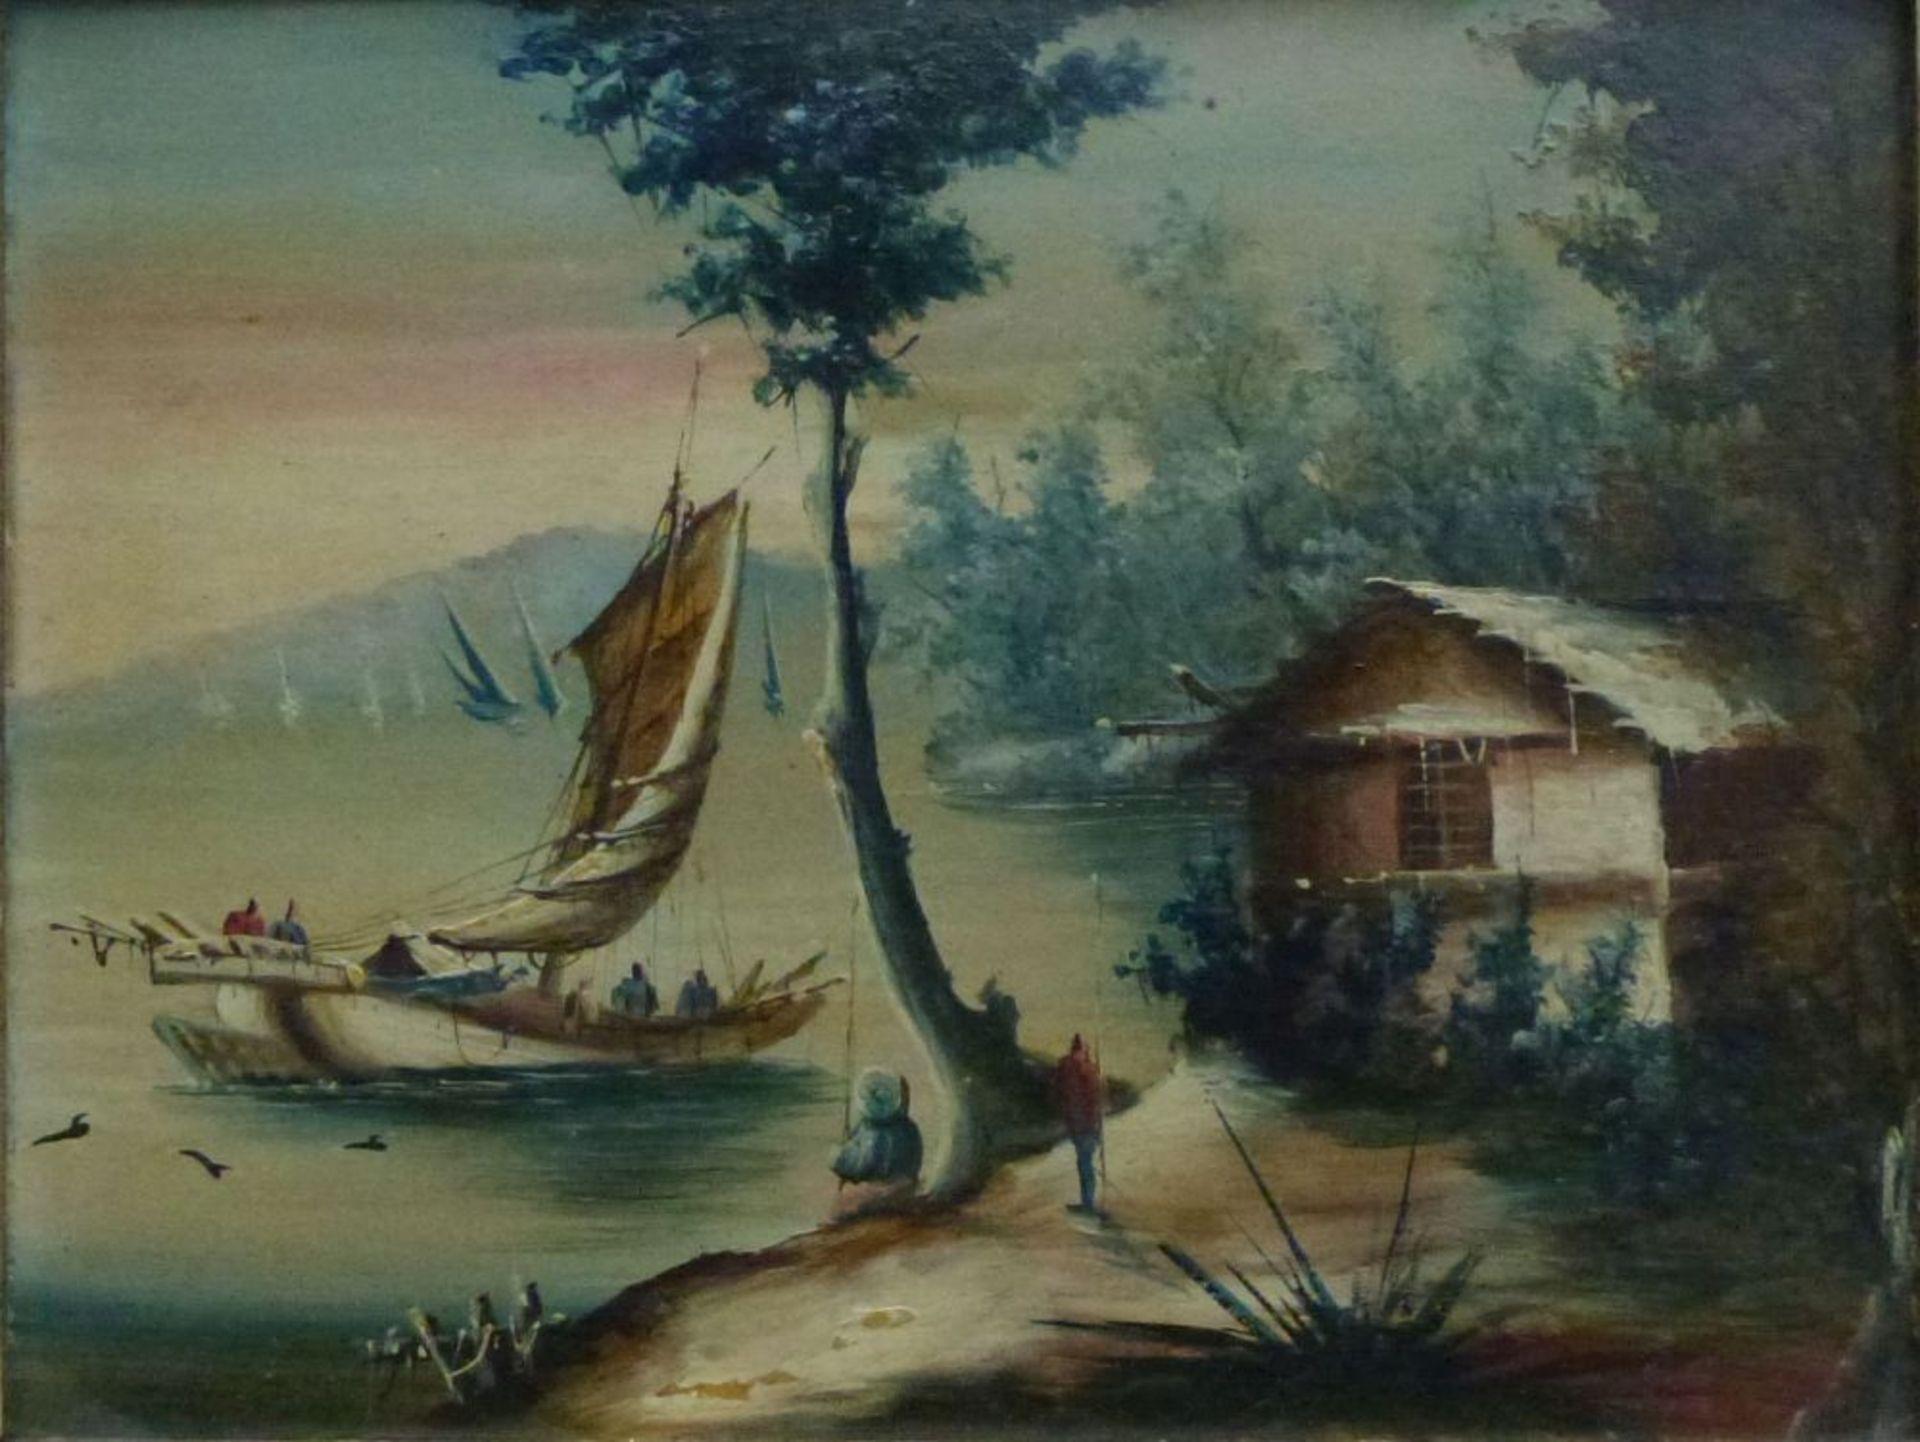 See, 1.Hälfte 20.Jh.Öl/Platte, Boote auf See, Hütte u. Personen am Ufer, Florentiner Leiste,